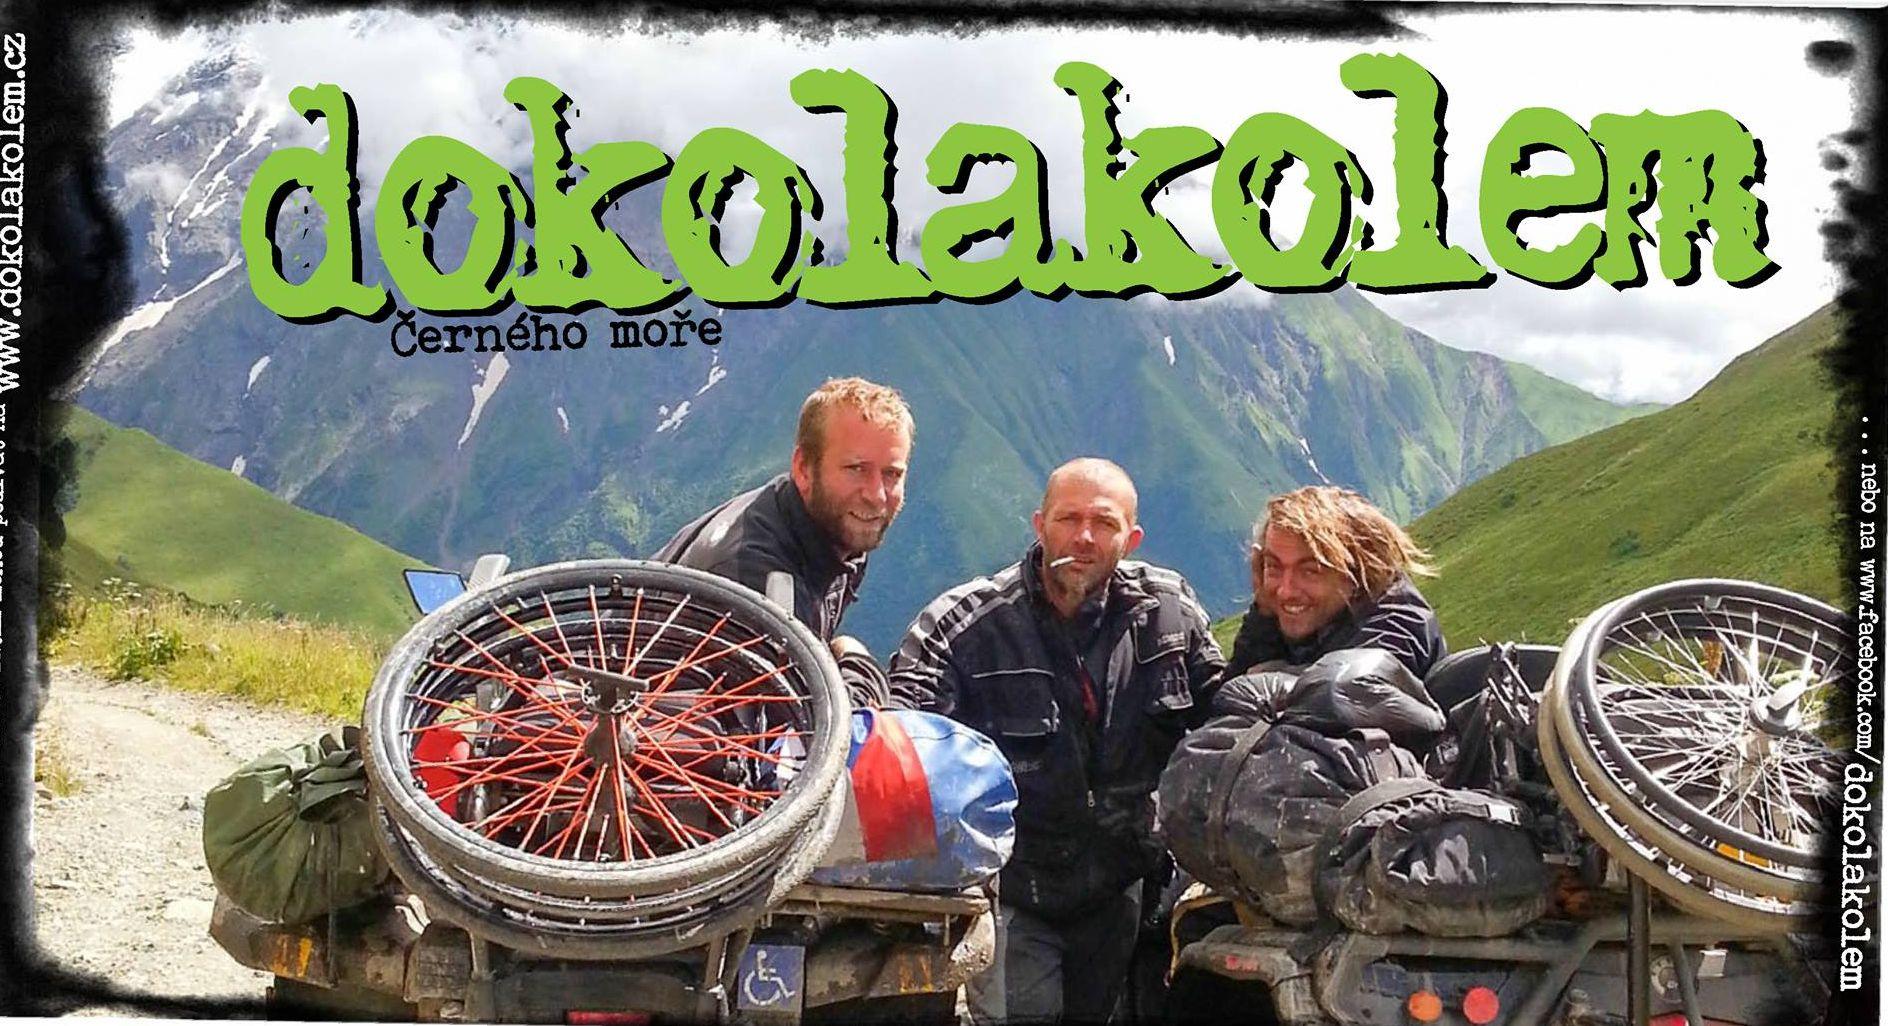 http://www.kolamadolu.cz/wp-content/uploads/2014/07/front.jpg